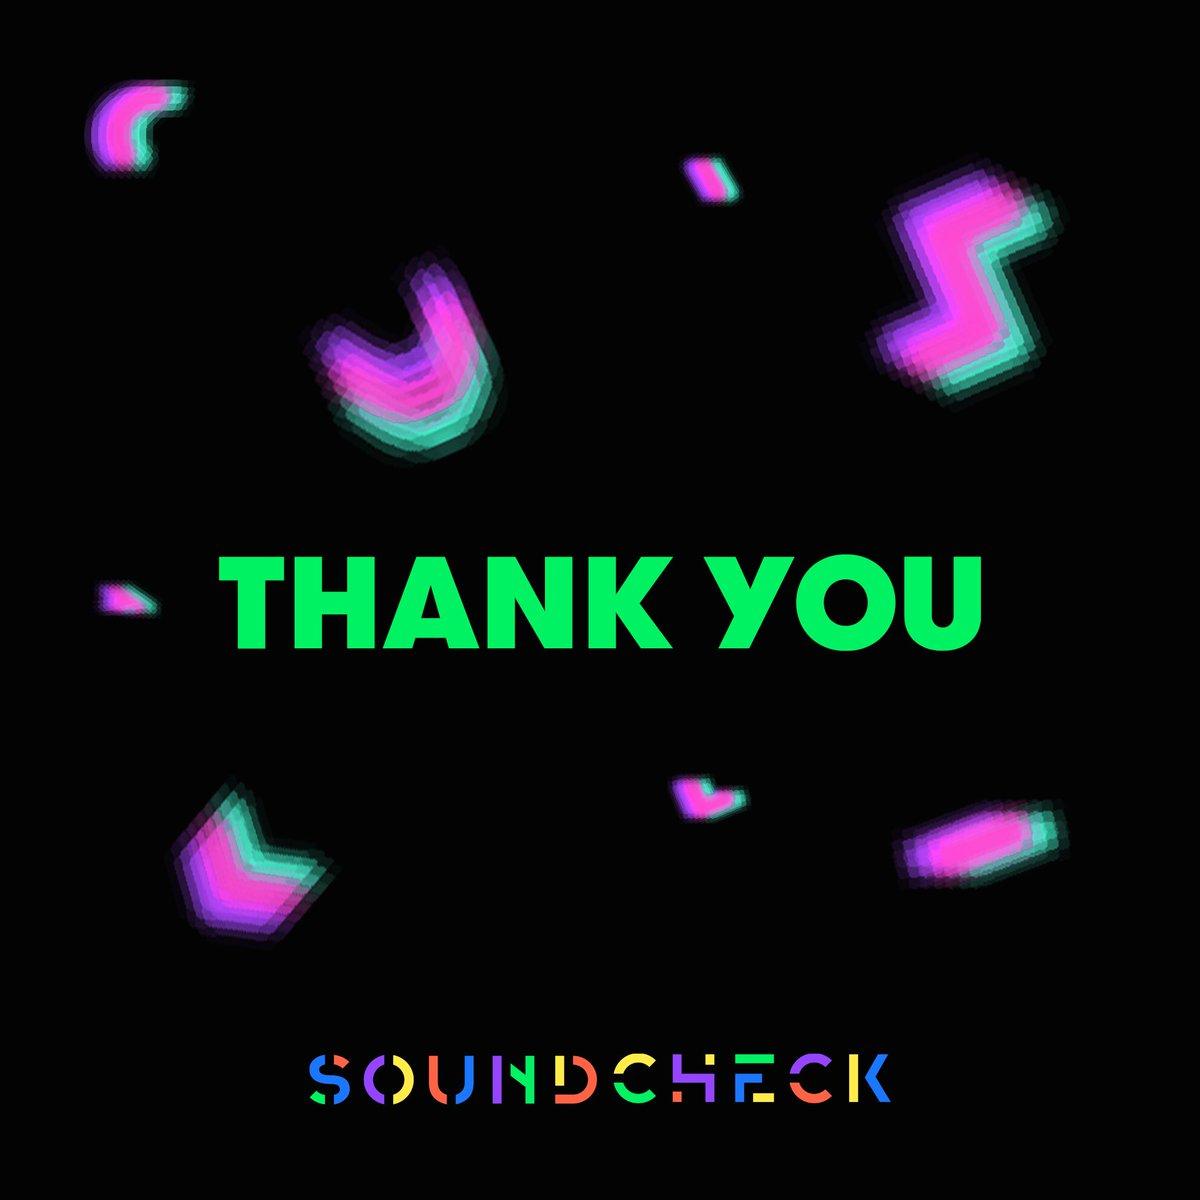 SOUNDCHECK PARTYに遊びに来てくれた皆様、ありがとうございました😈💚またすぐ会いましょう🙋♀️ #soundcheckjp #soundcheckparty https://t.co/gfnLWFqtkJ